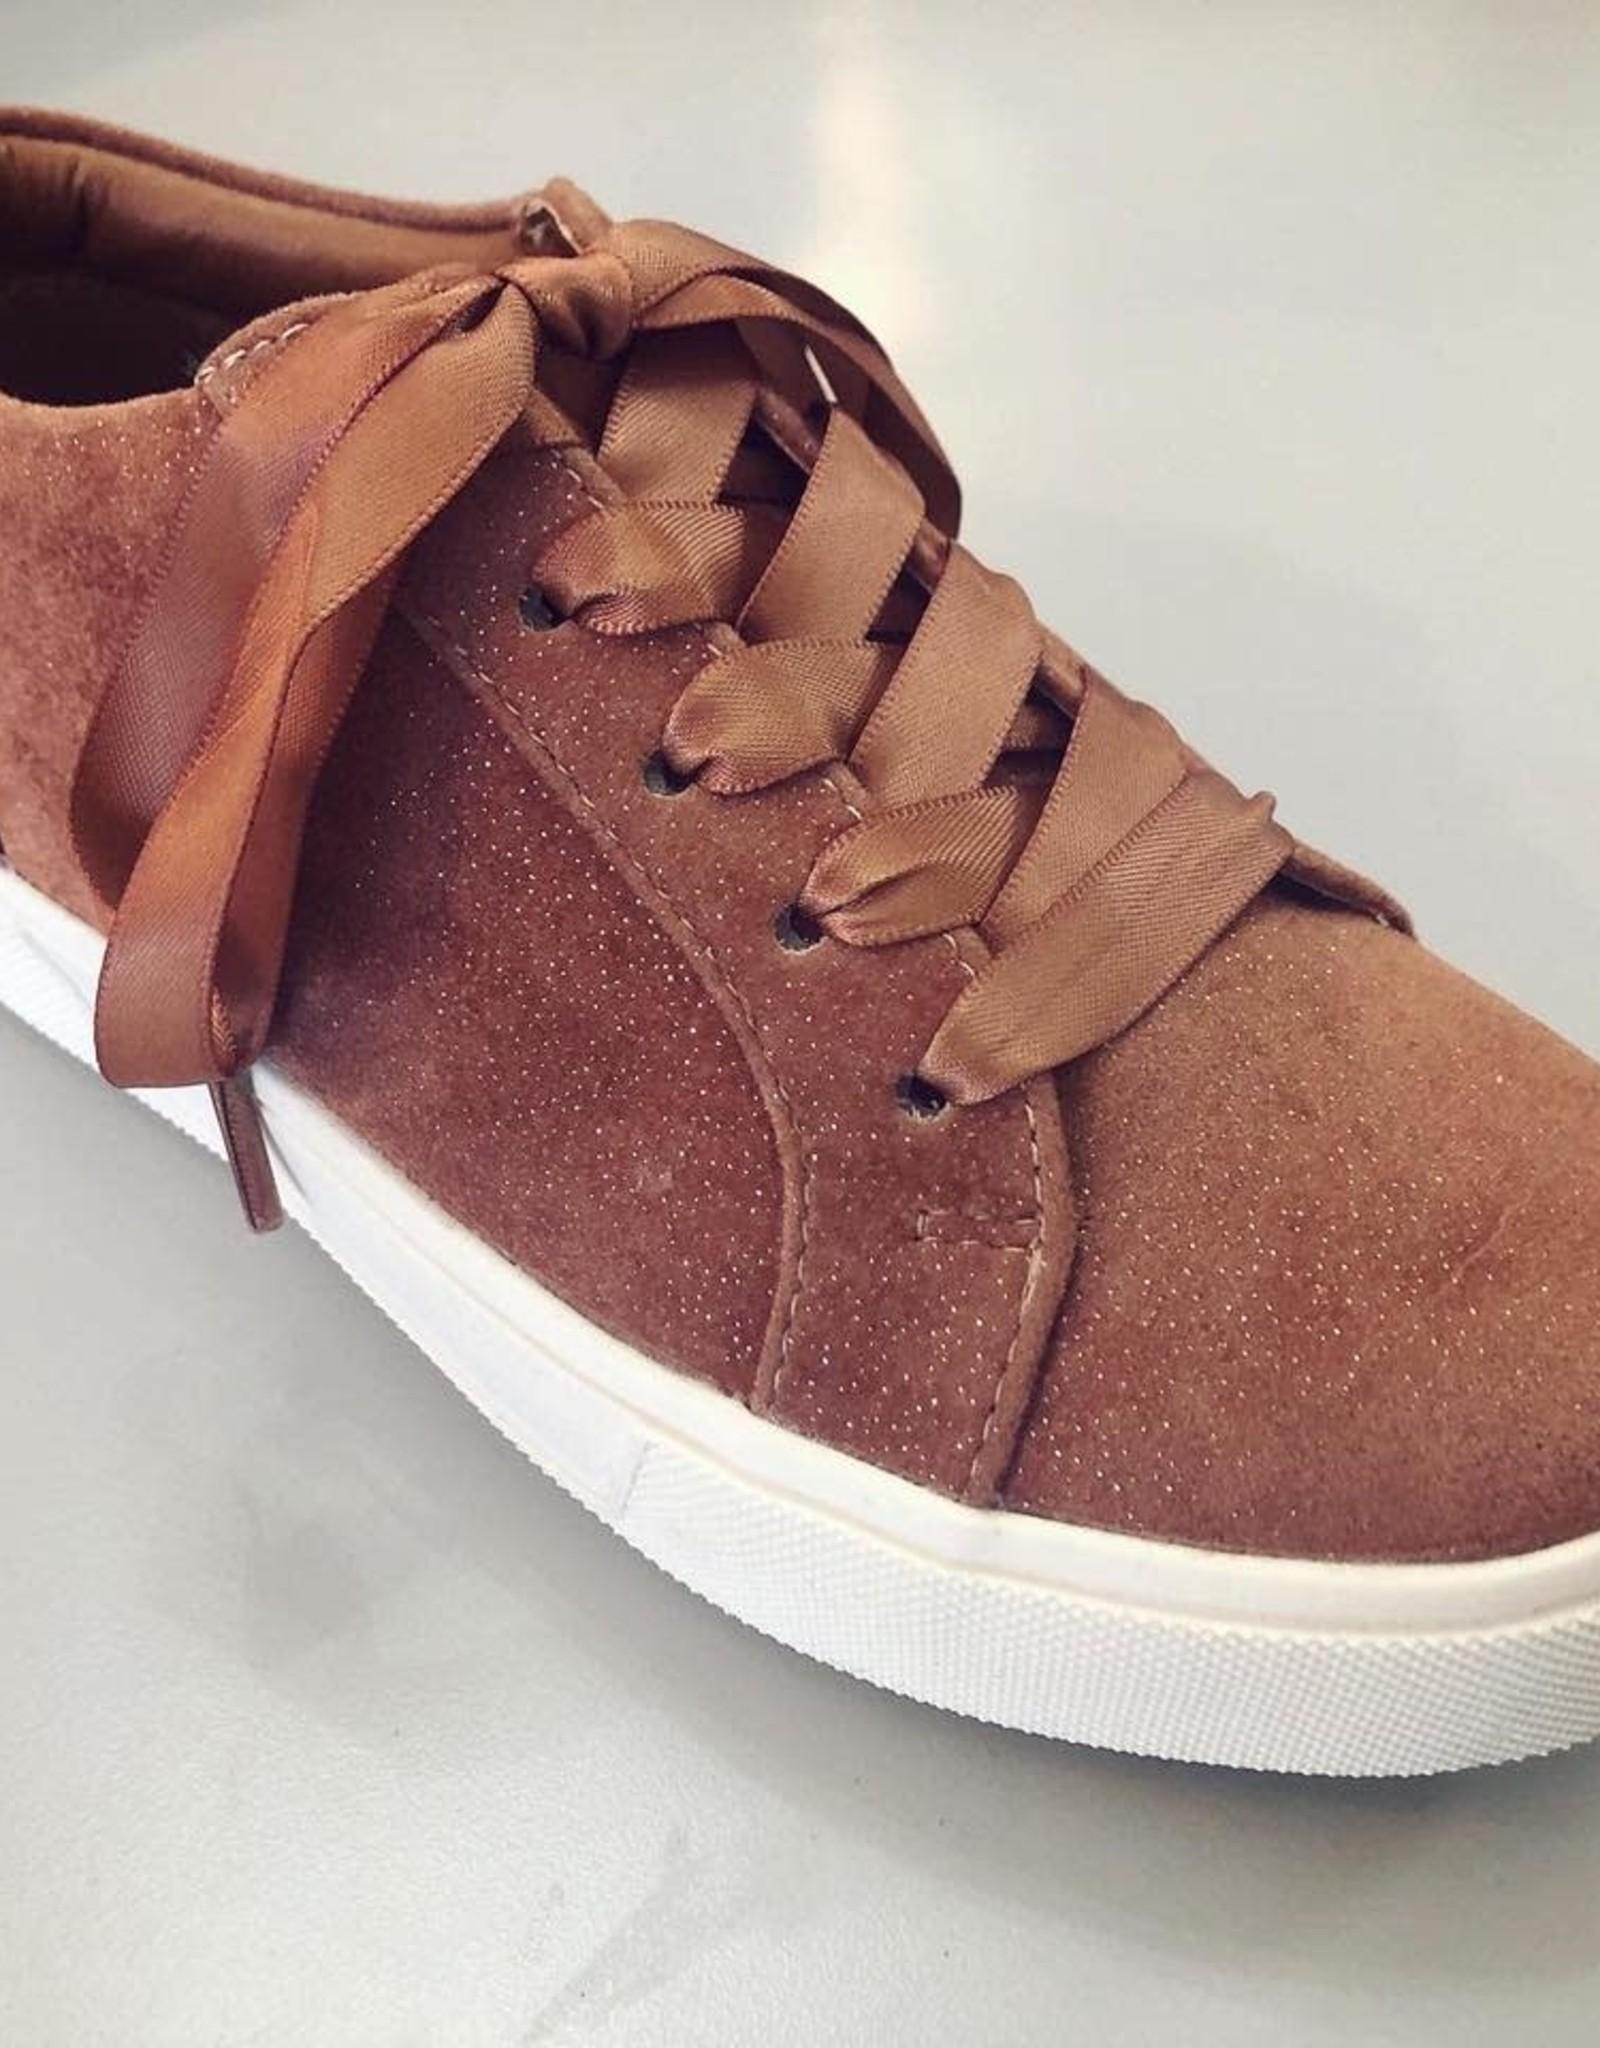 Volatile Tripp Velvet Lace Up Sneaker in Blush